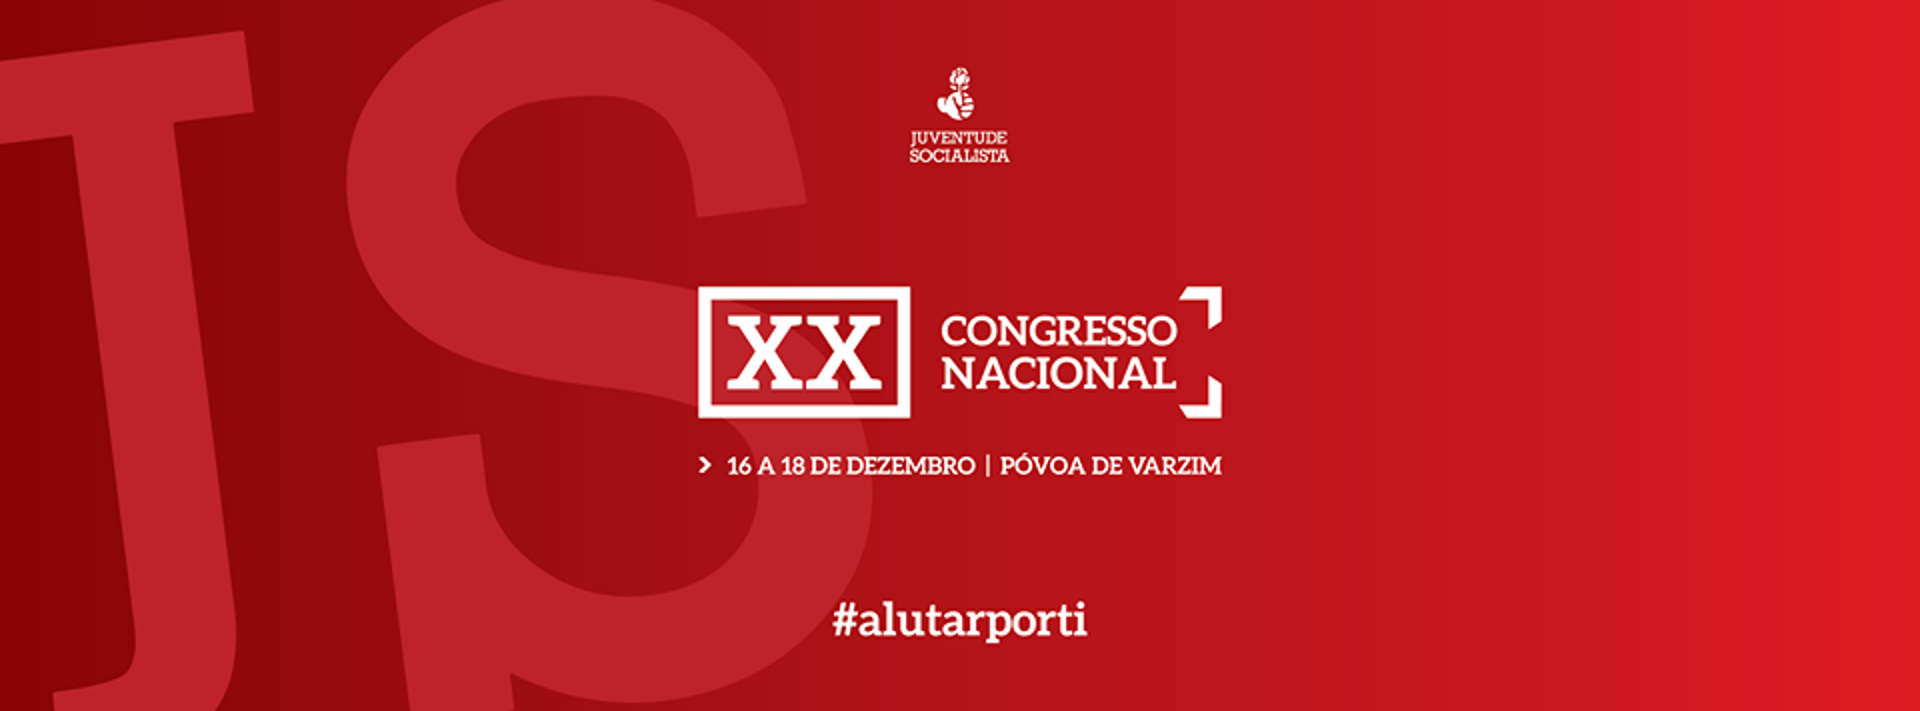 capa-xx-congresso-nacional-da-js-2-1920x711